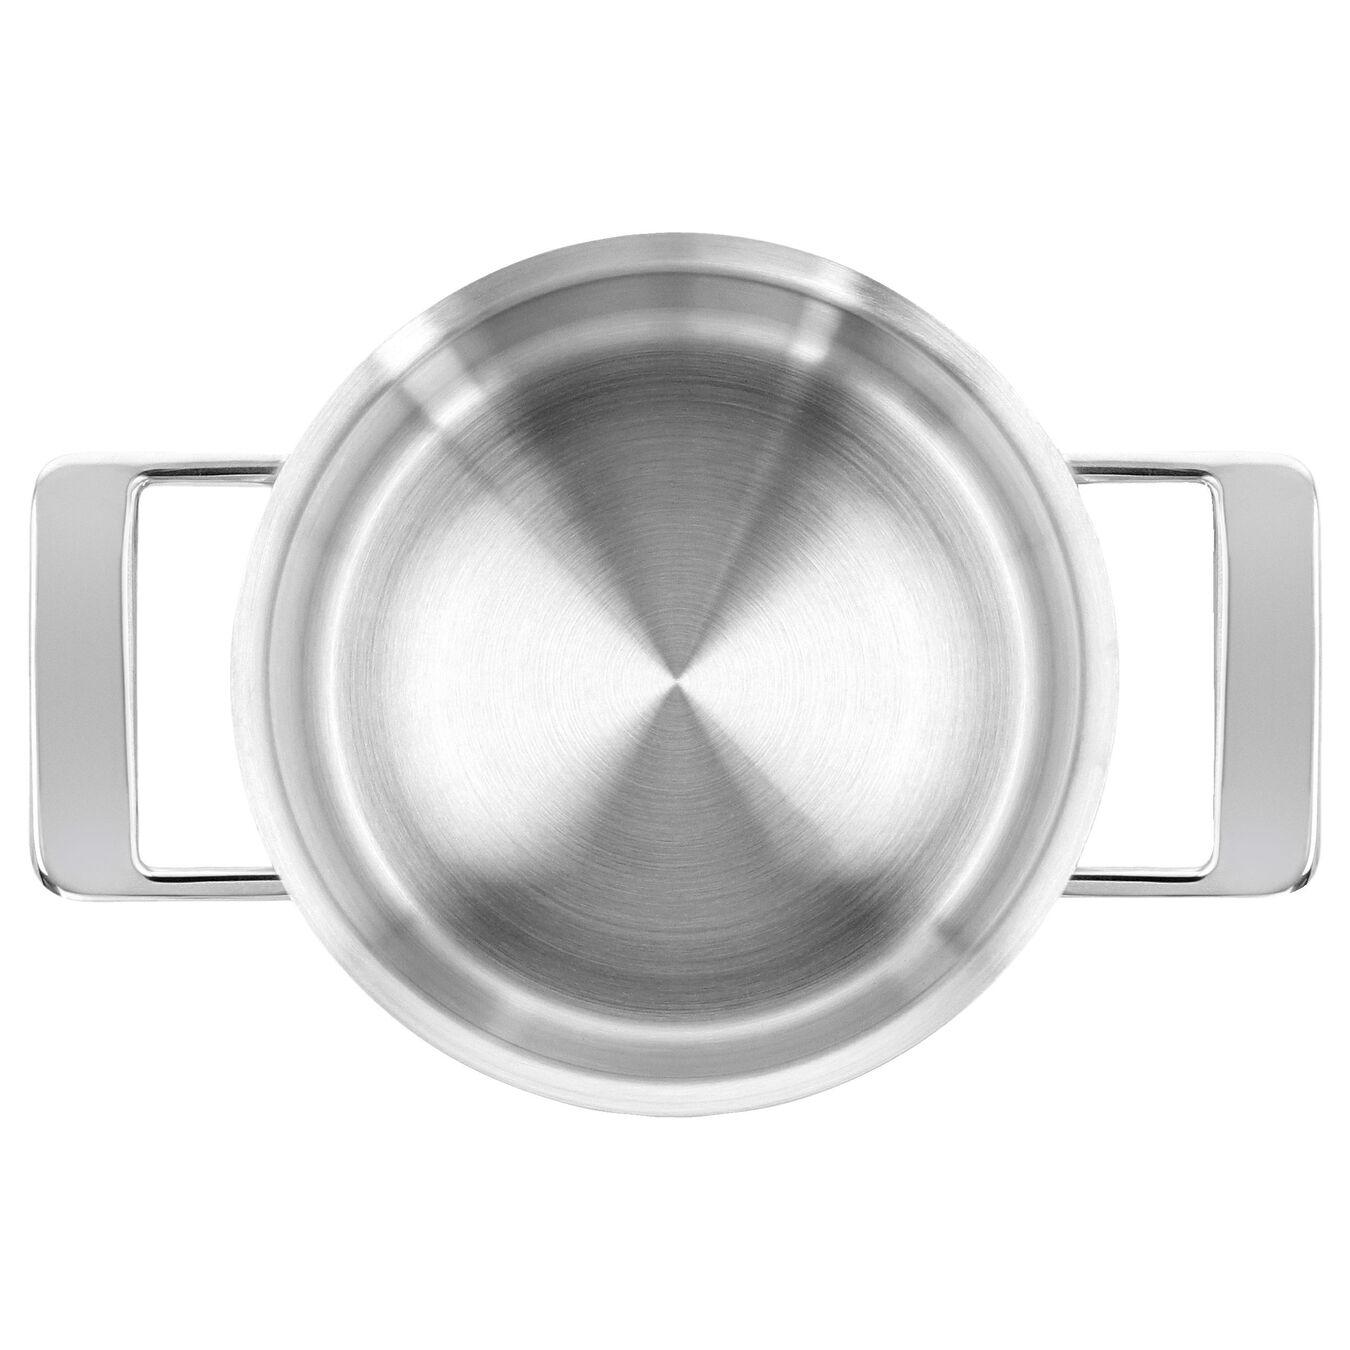 Kookpot met dubbelwandig deksel 16 cm / 1,5 l,,large 2